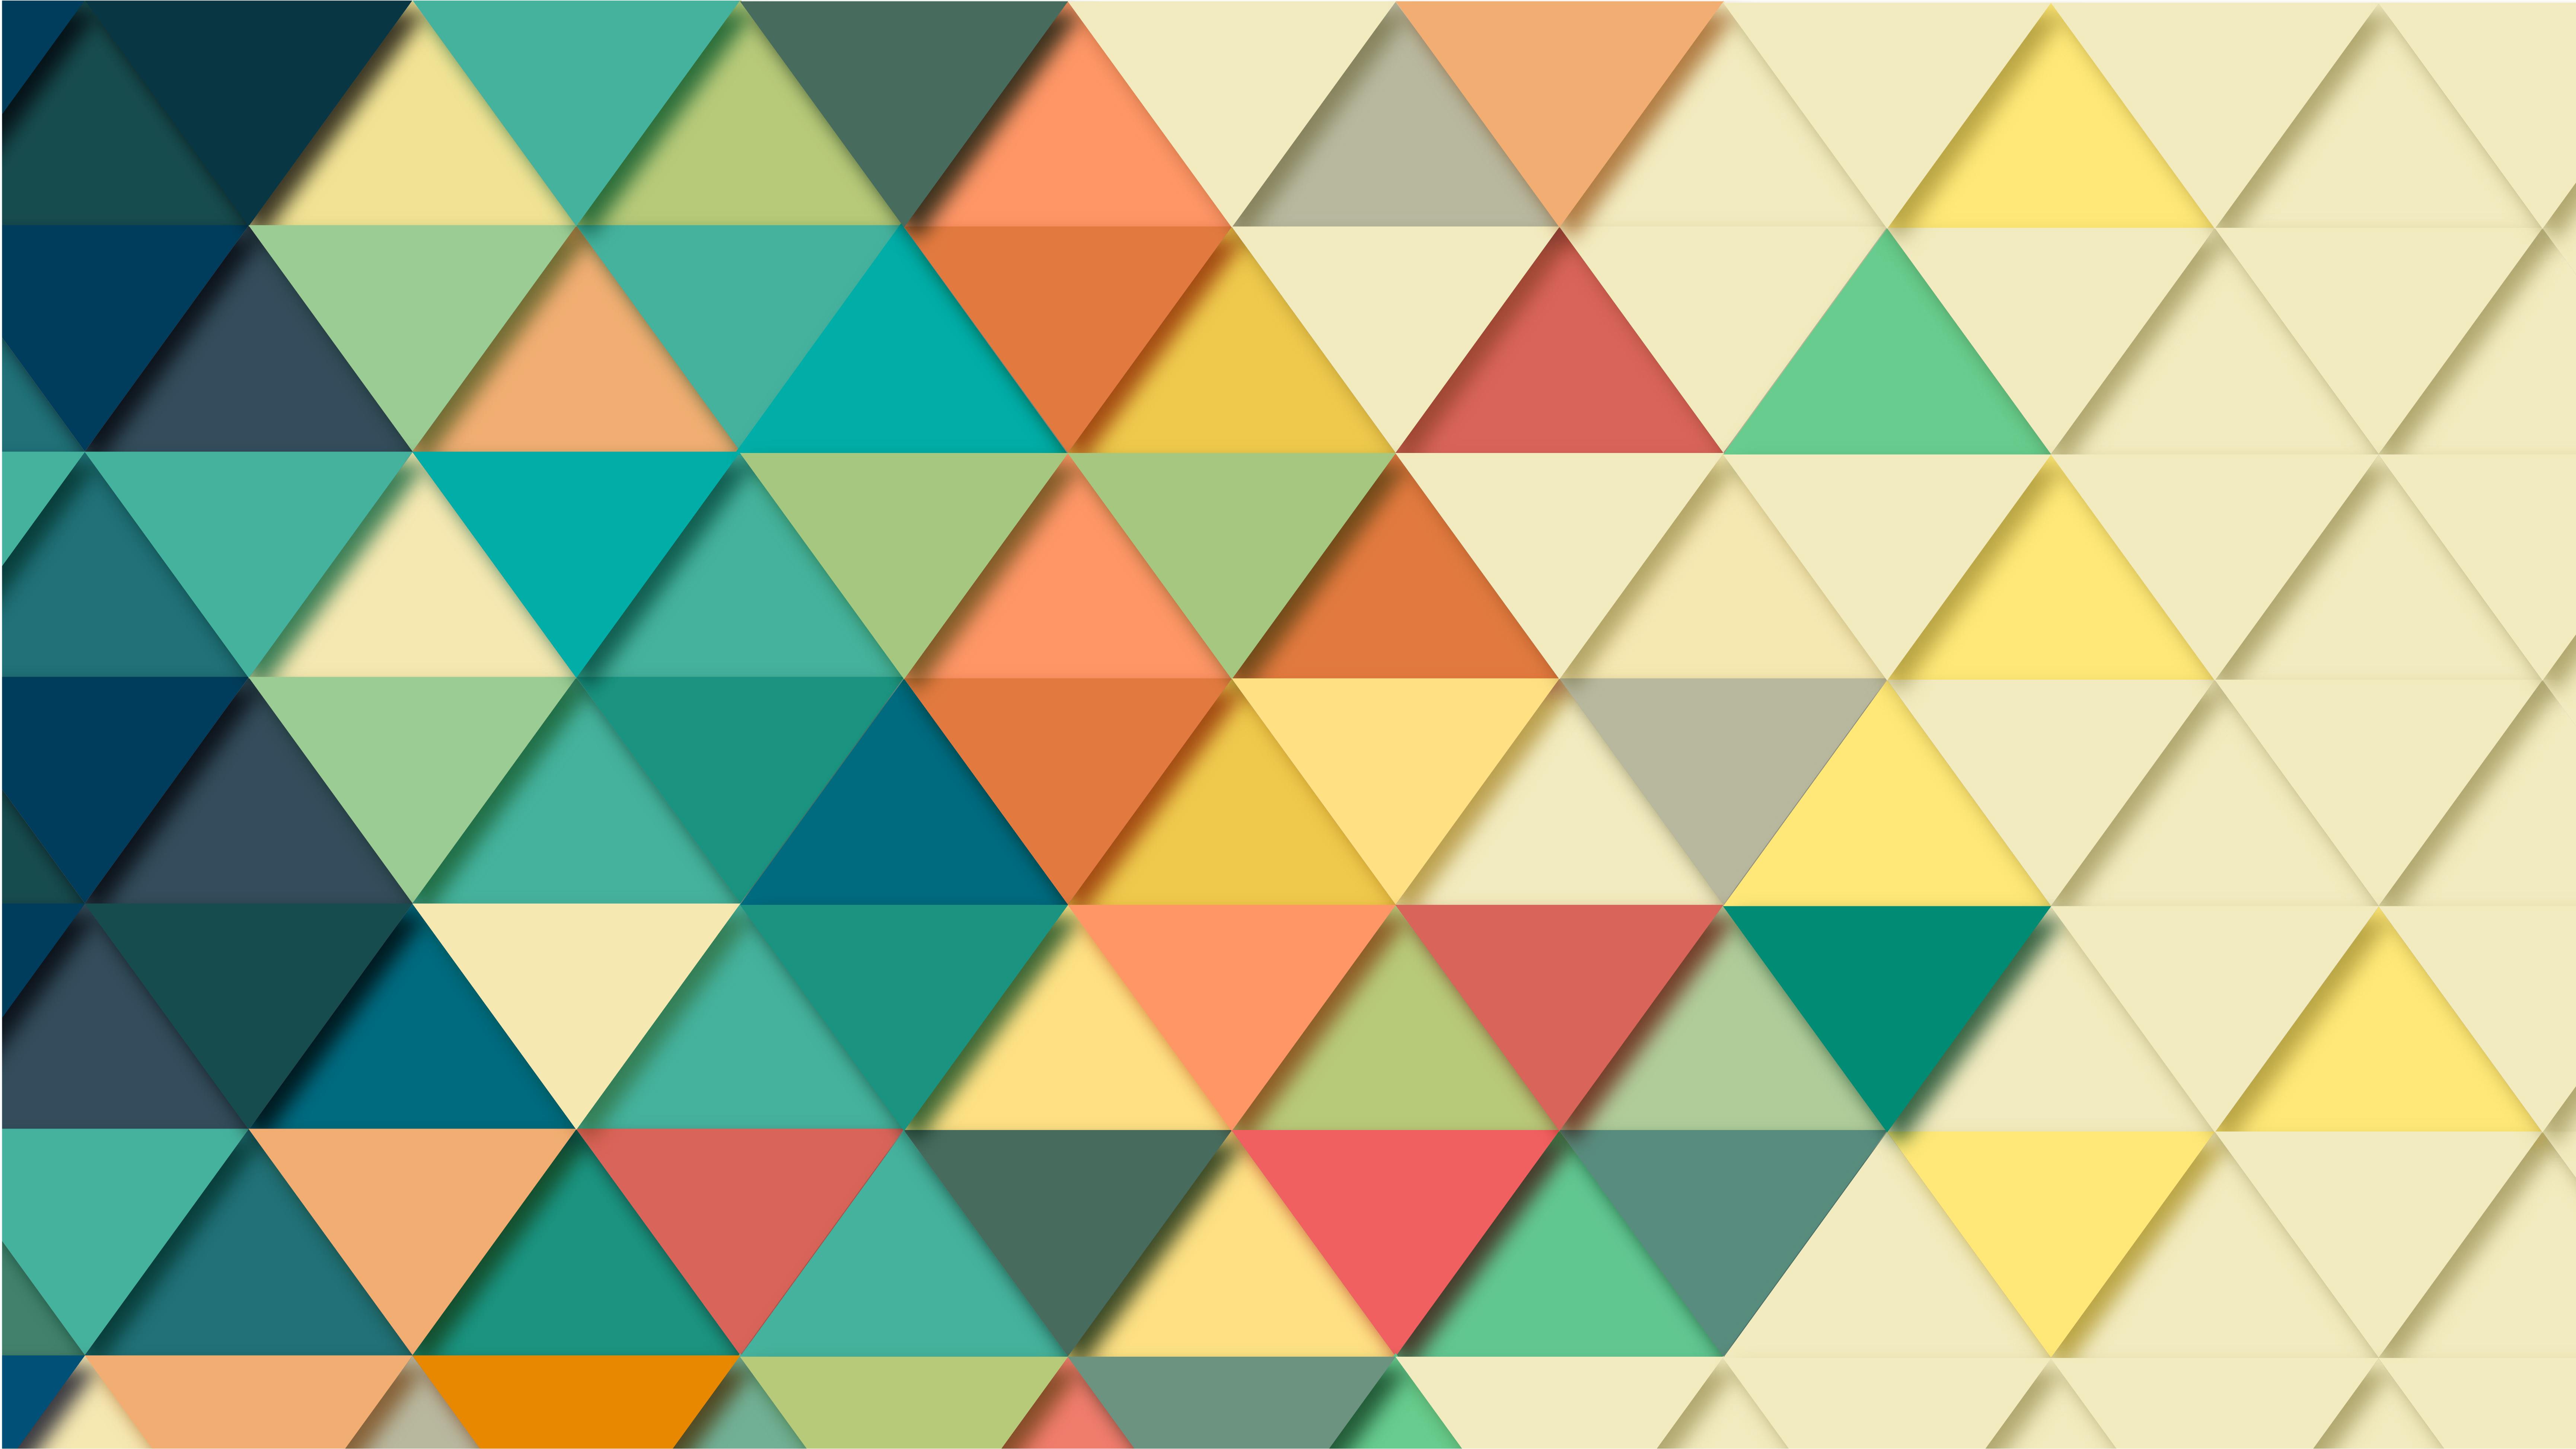 Geometric Animal Wallpaper 74 Images: Colour Triangles Wallpaper 5k Retina Ultra HD Wallpaper